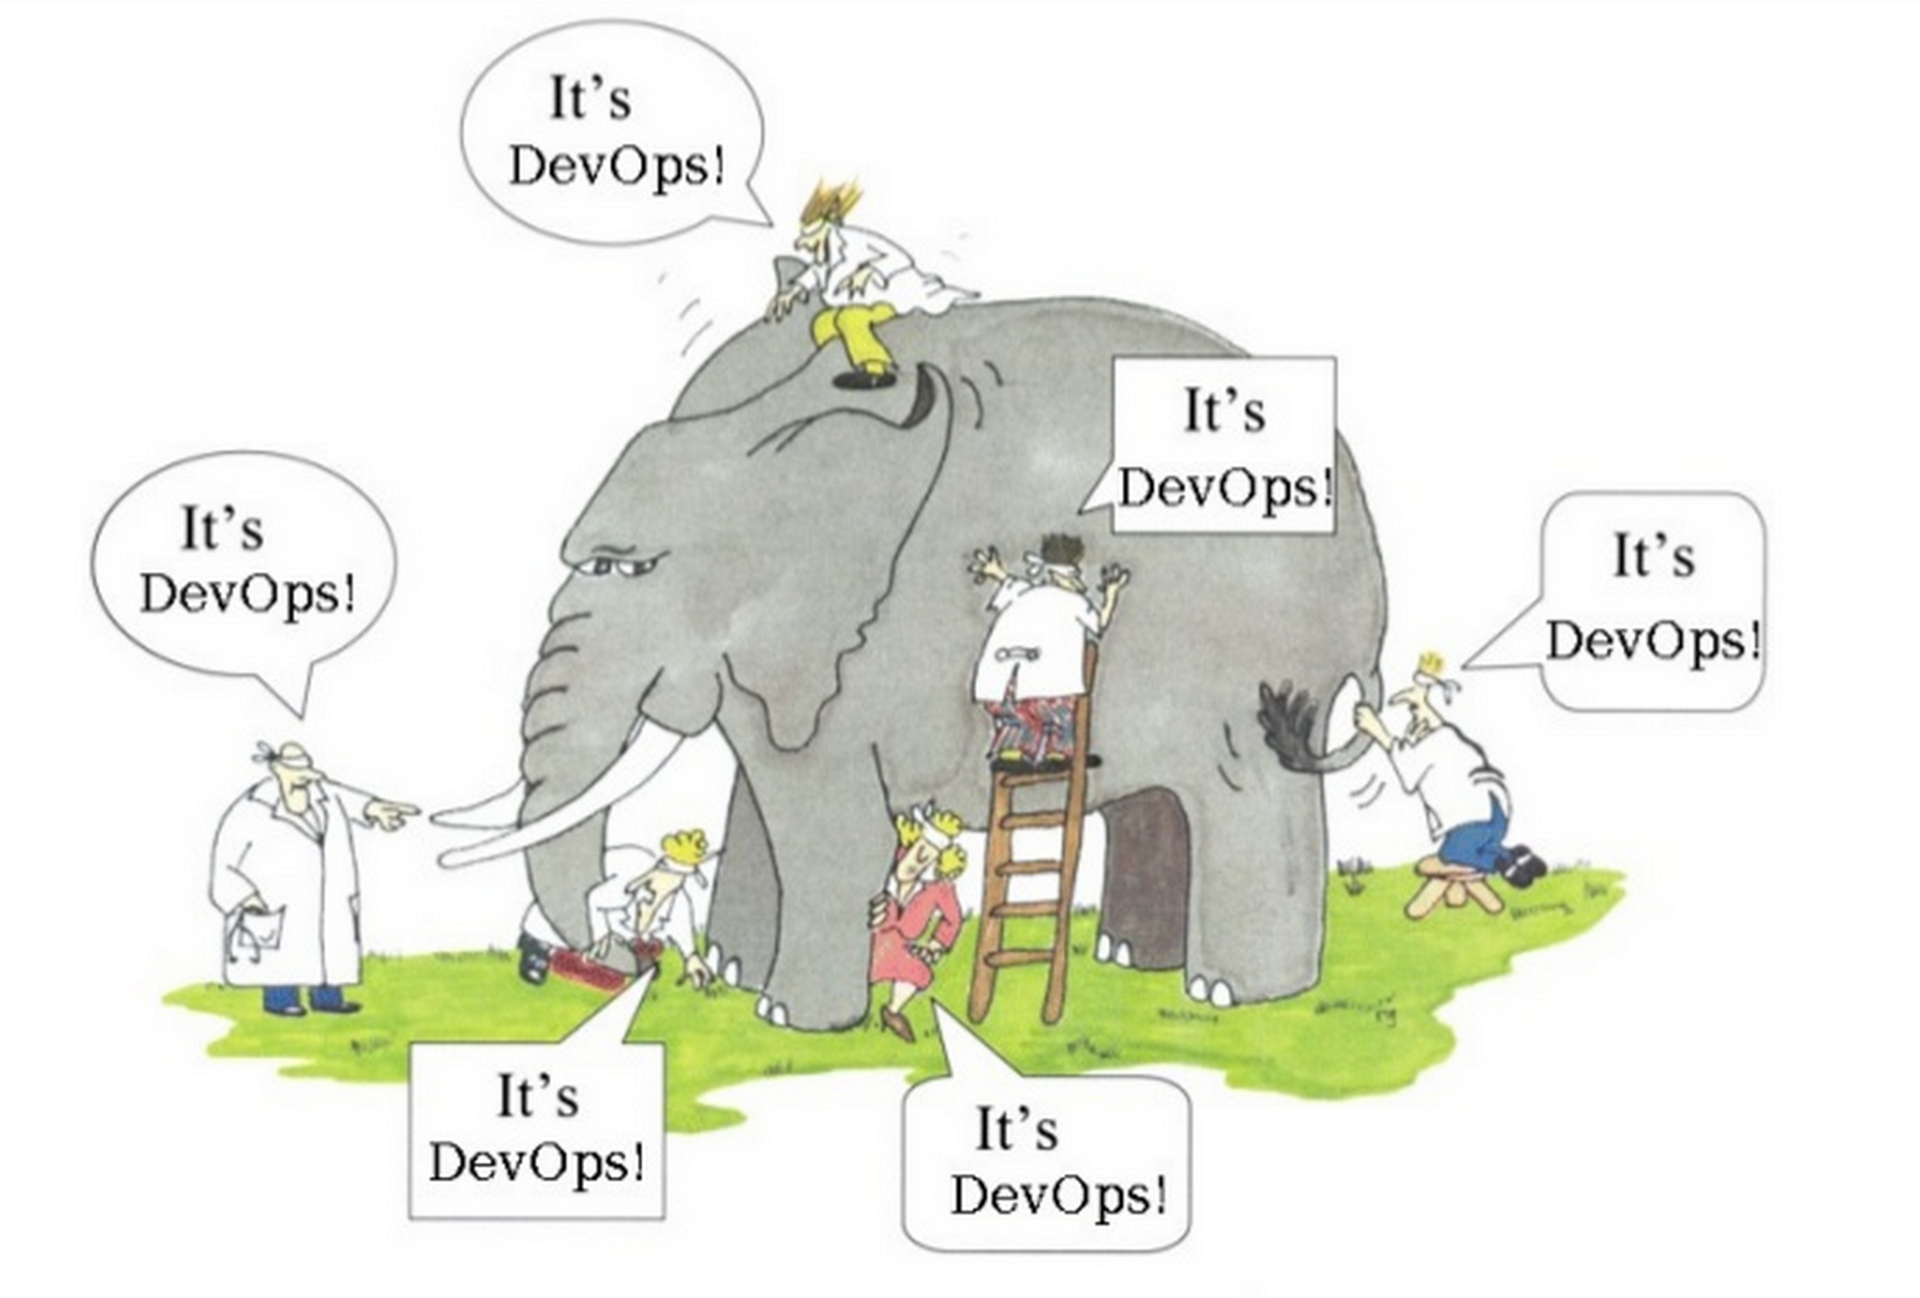 История успеха, или DEV+DEVOPS+OPS - 1